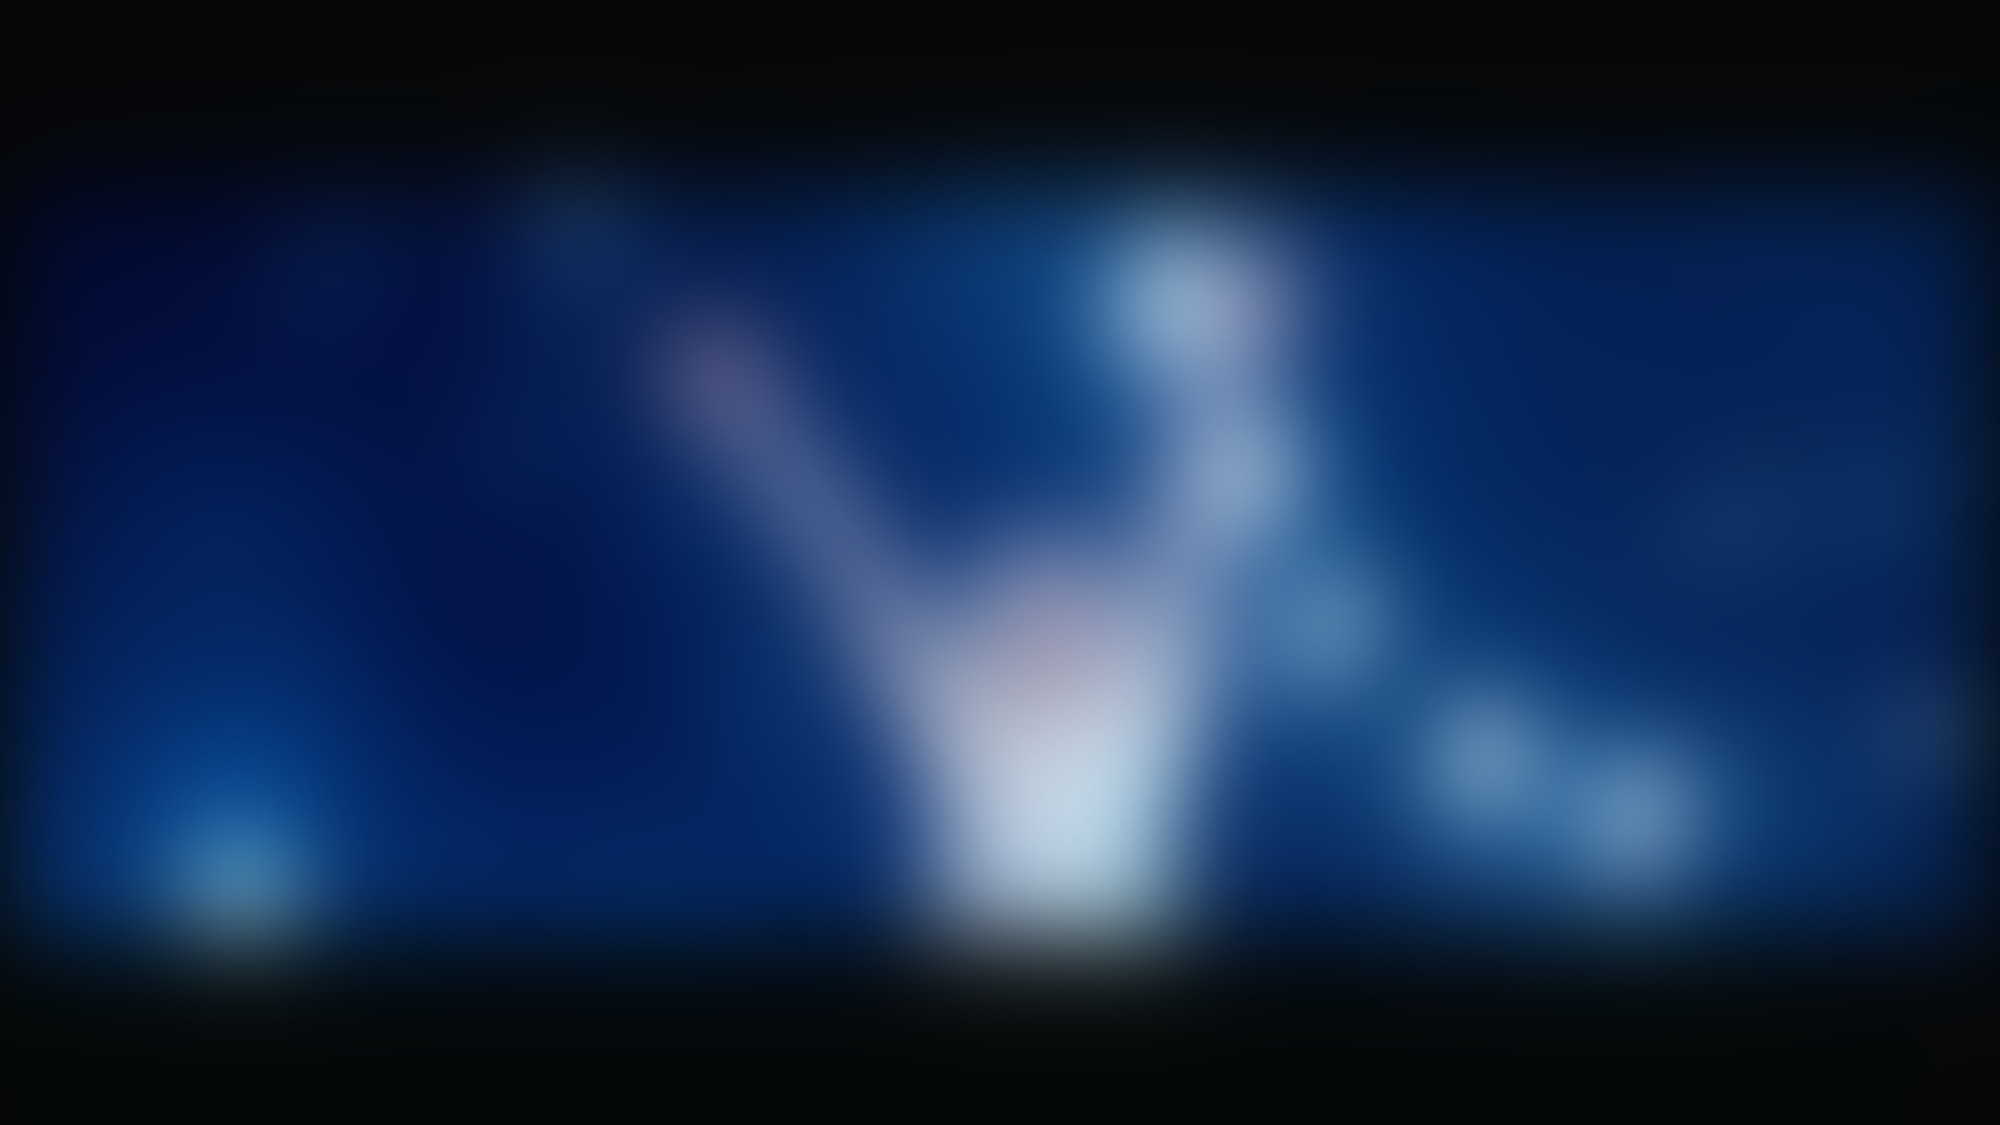 Davidwilson arcadefire autocompressfitresizeixlibphp 1 1 0max h2000max w3 D2000q80sa6ce848bfcf32be3bd8fa201e487232d